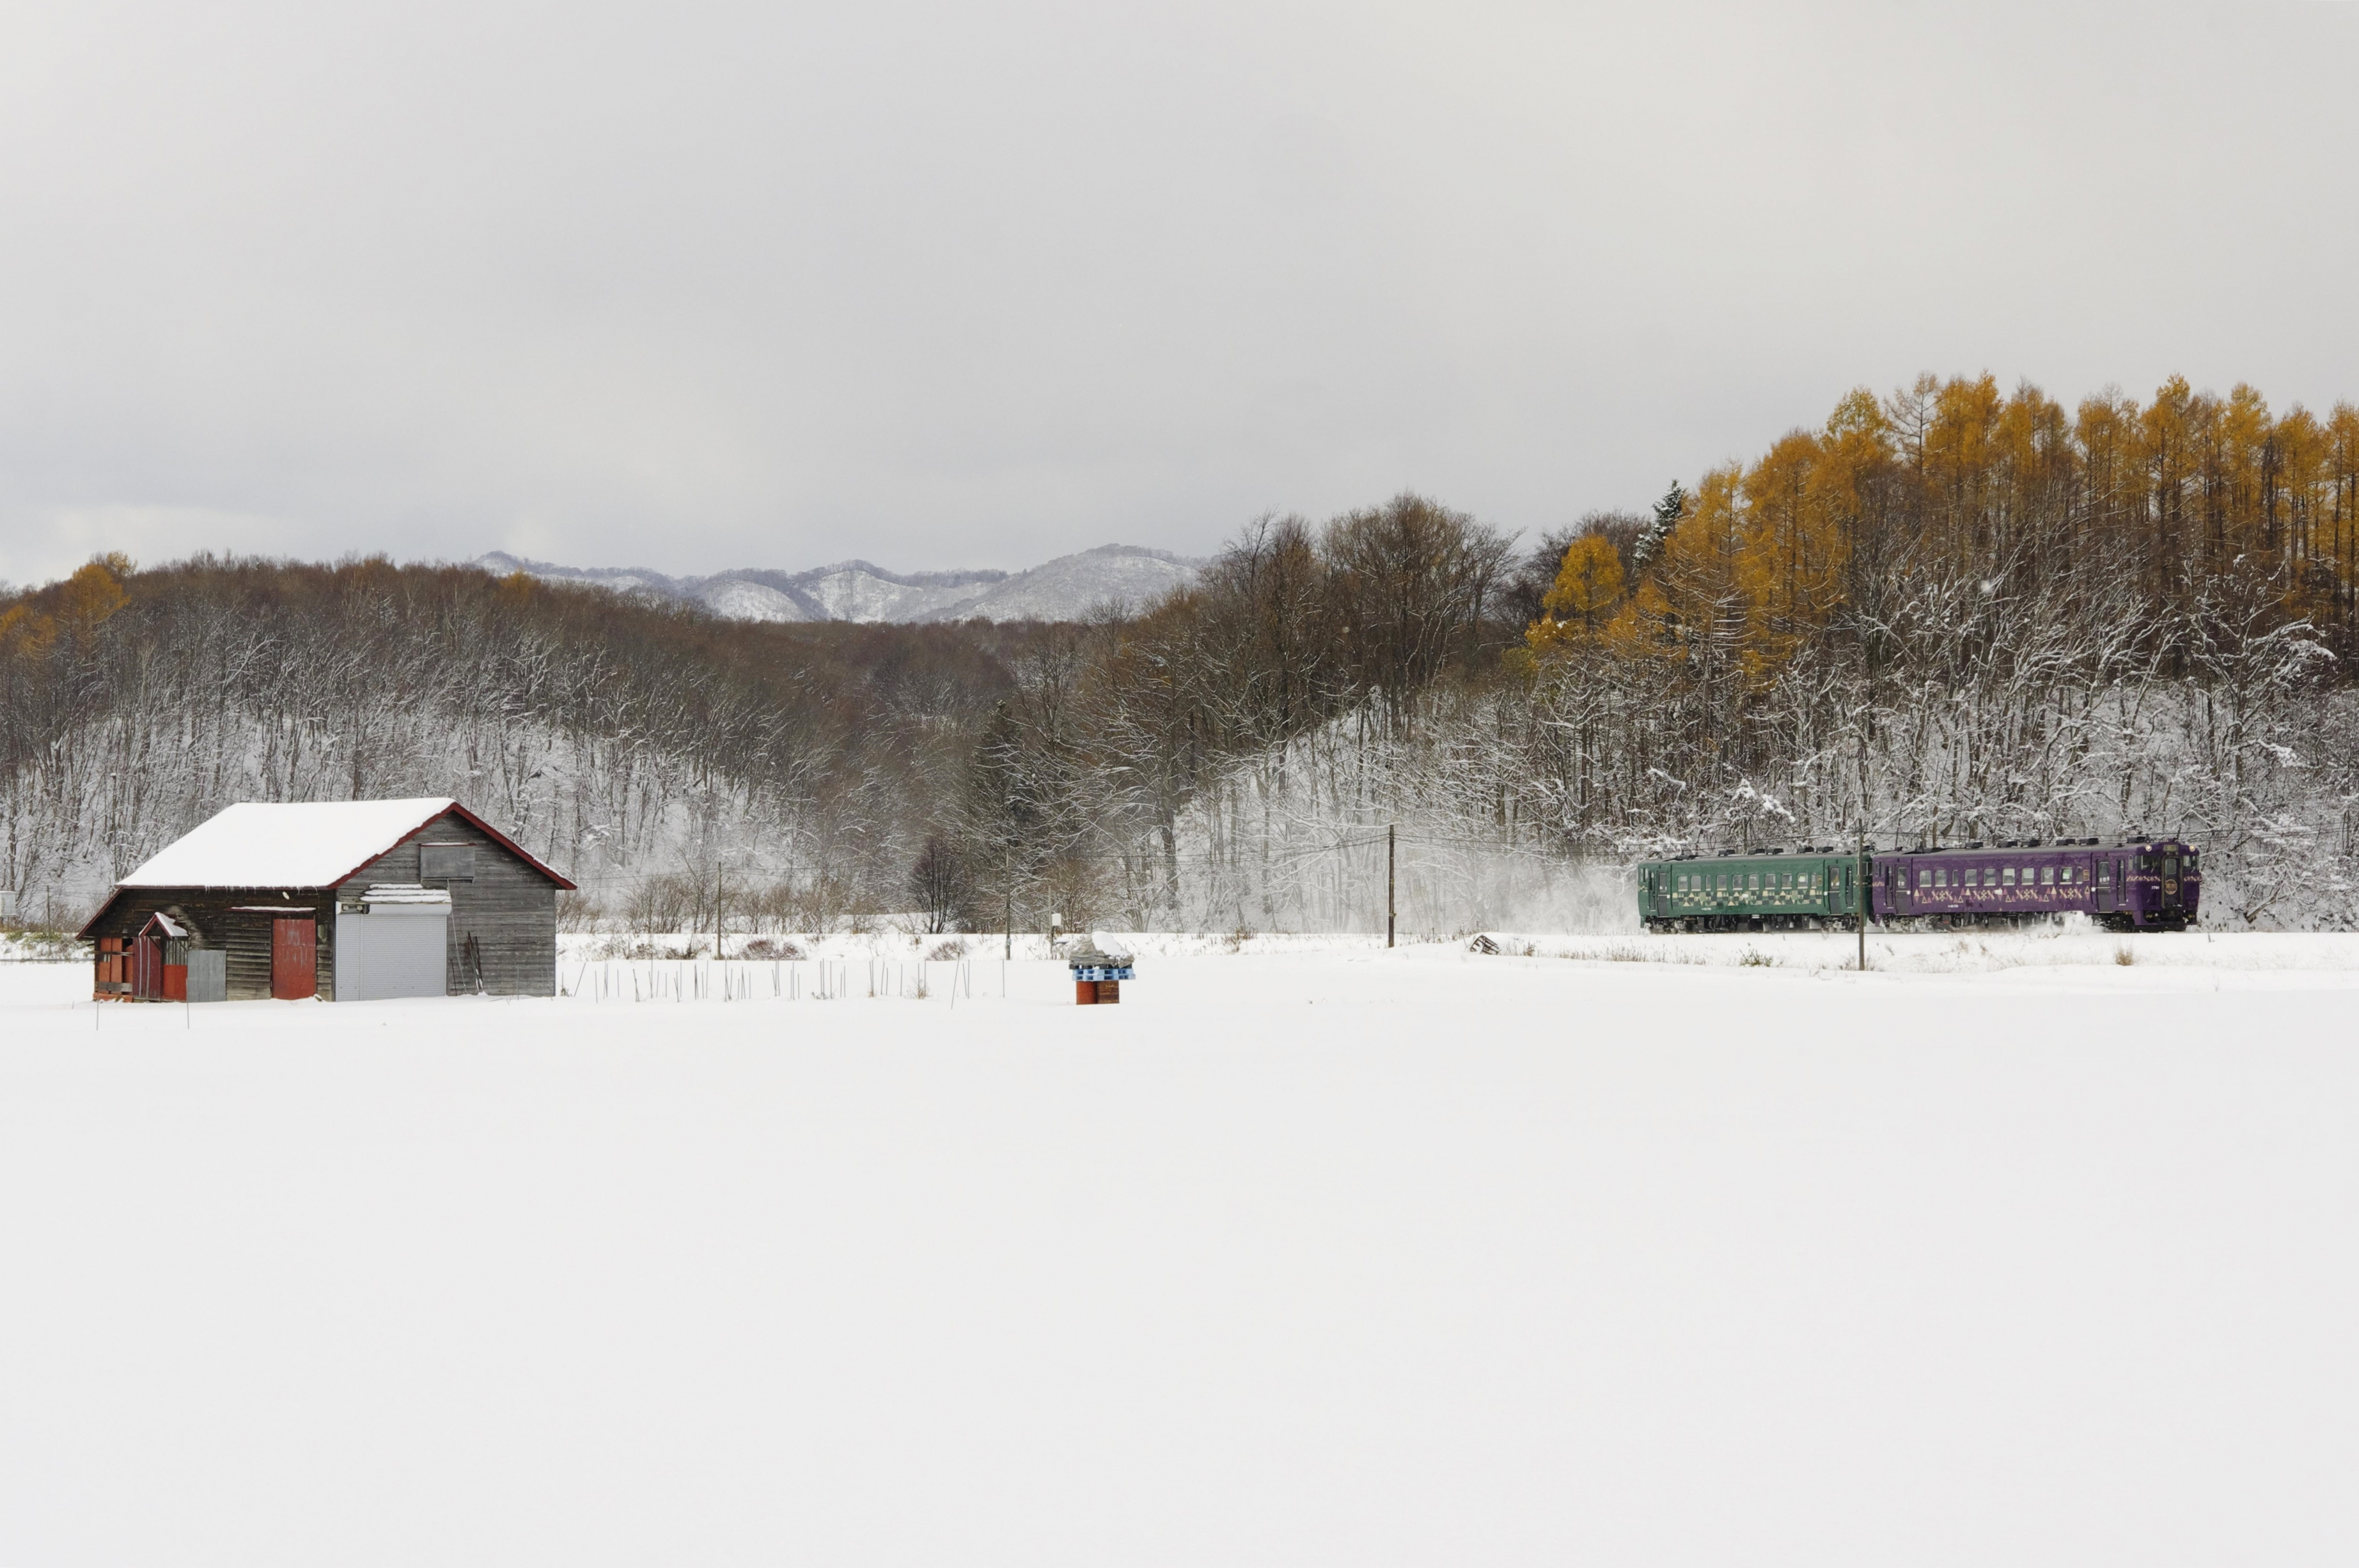 キハ40 紫水山明号 晩生内−札的 191117-1.jpg